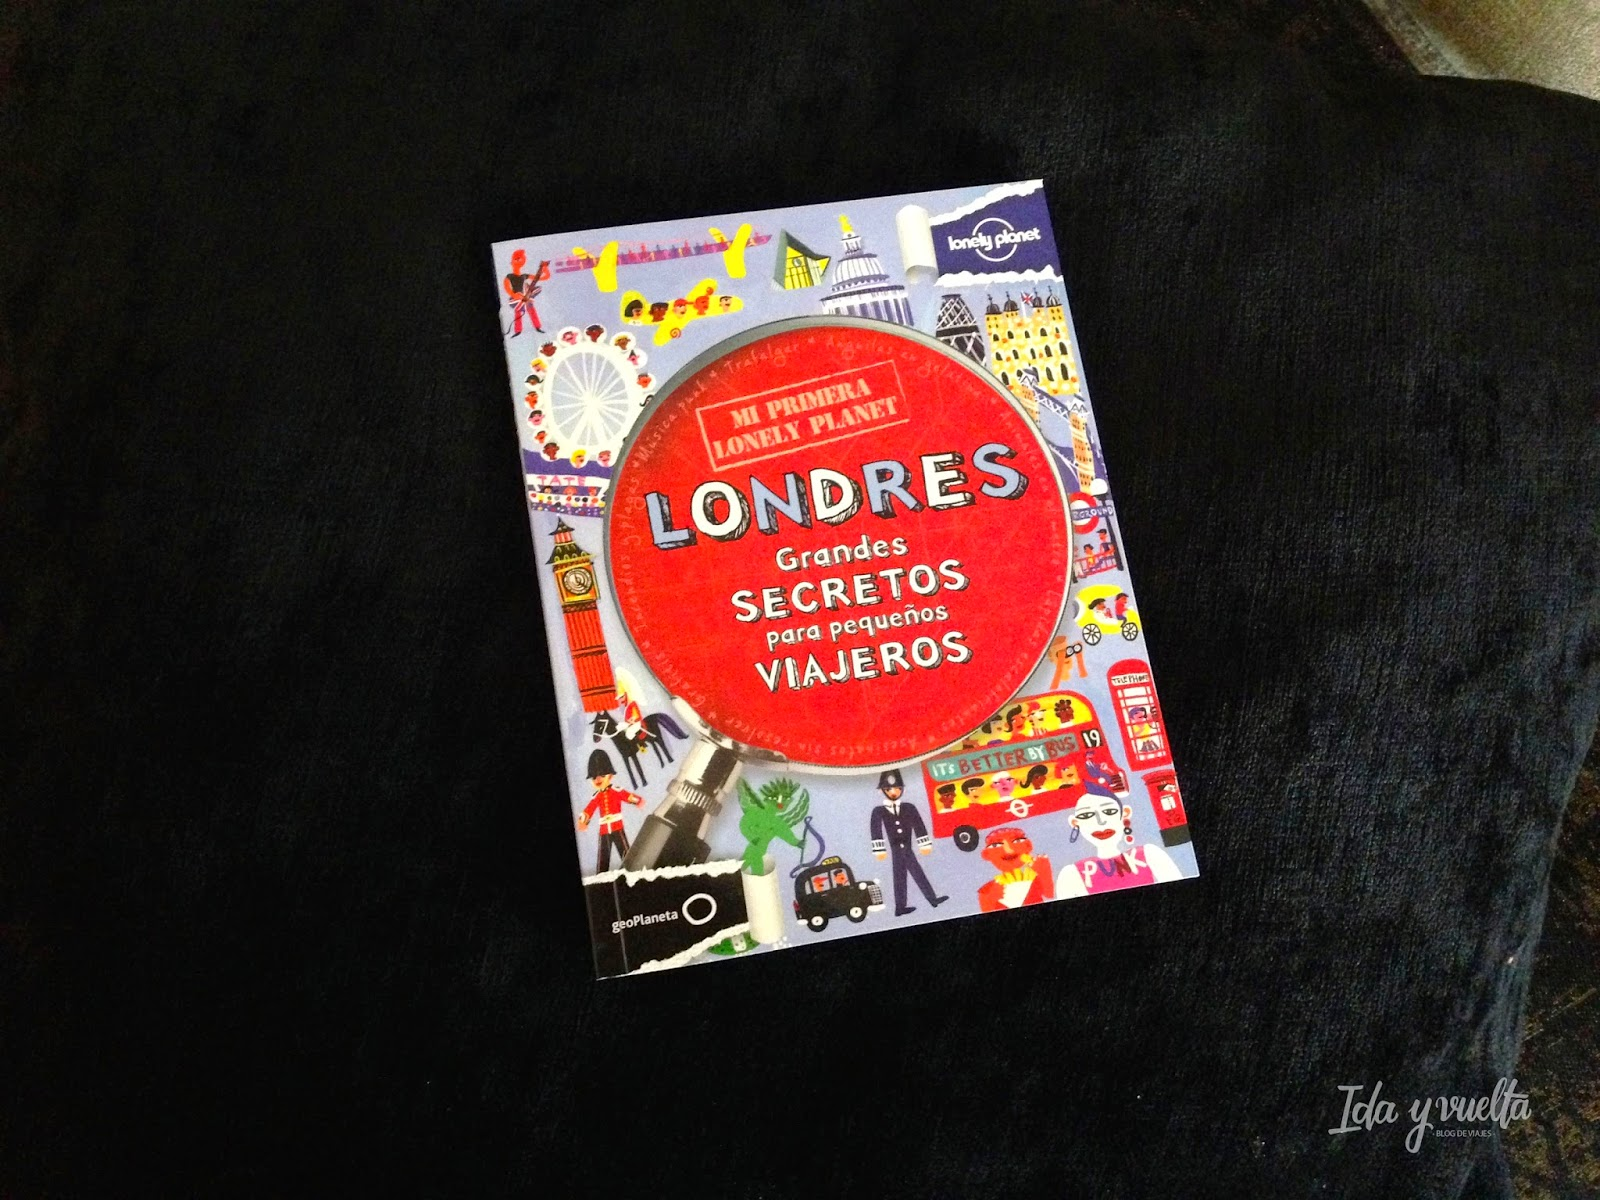 Mi primera Lonely Planet de Londres